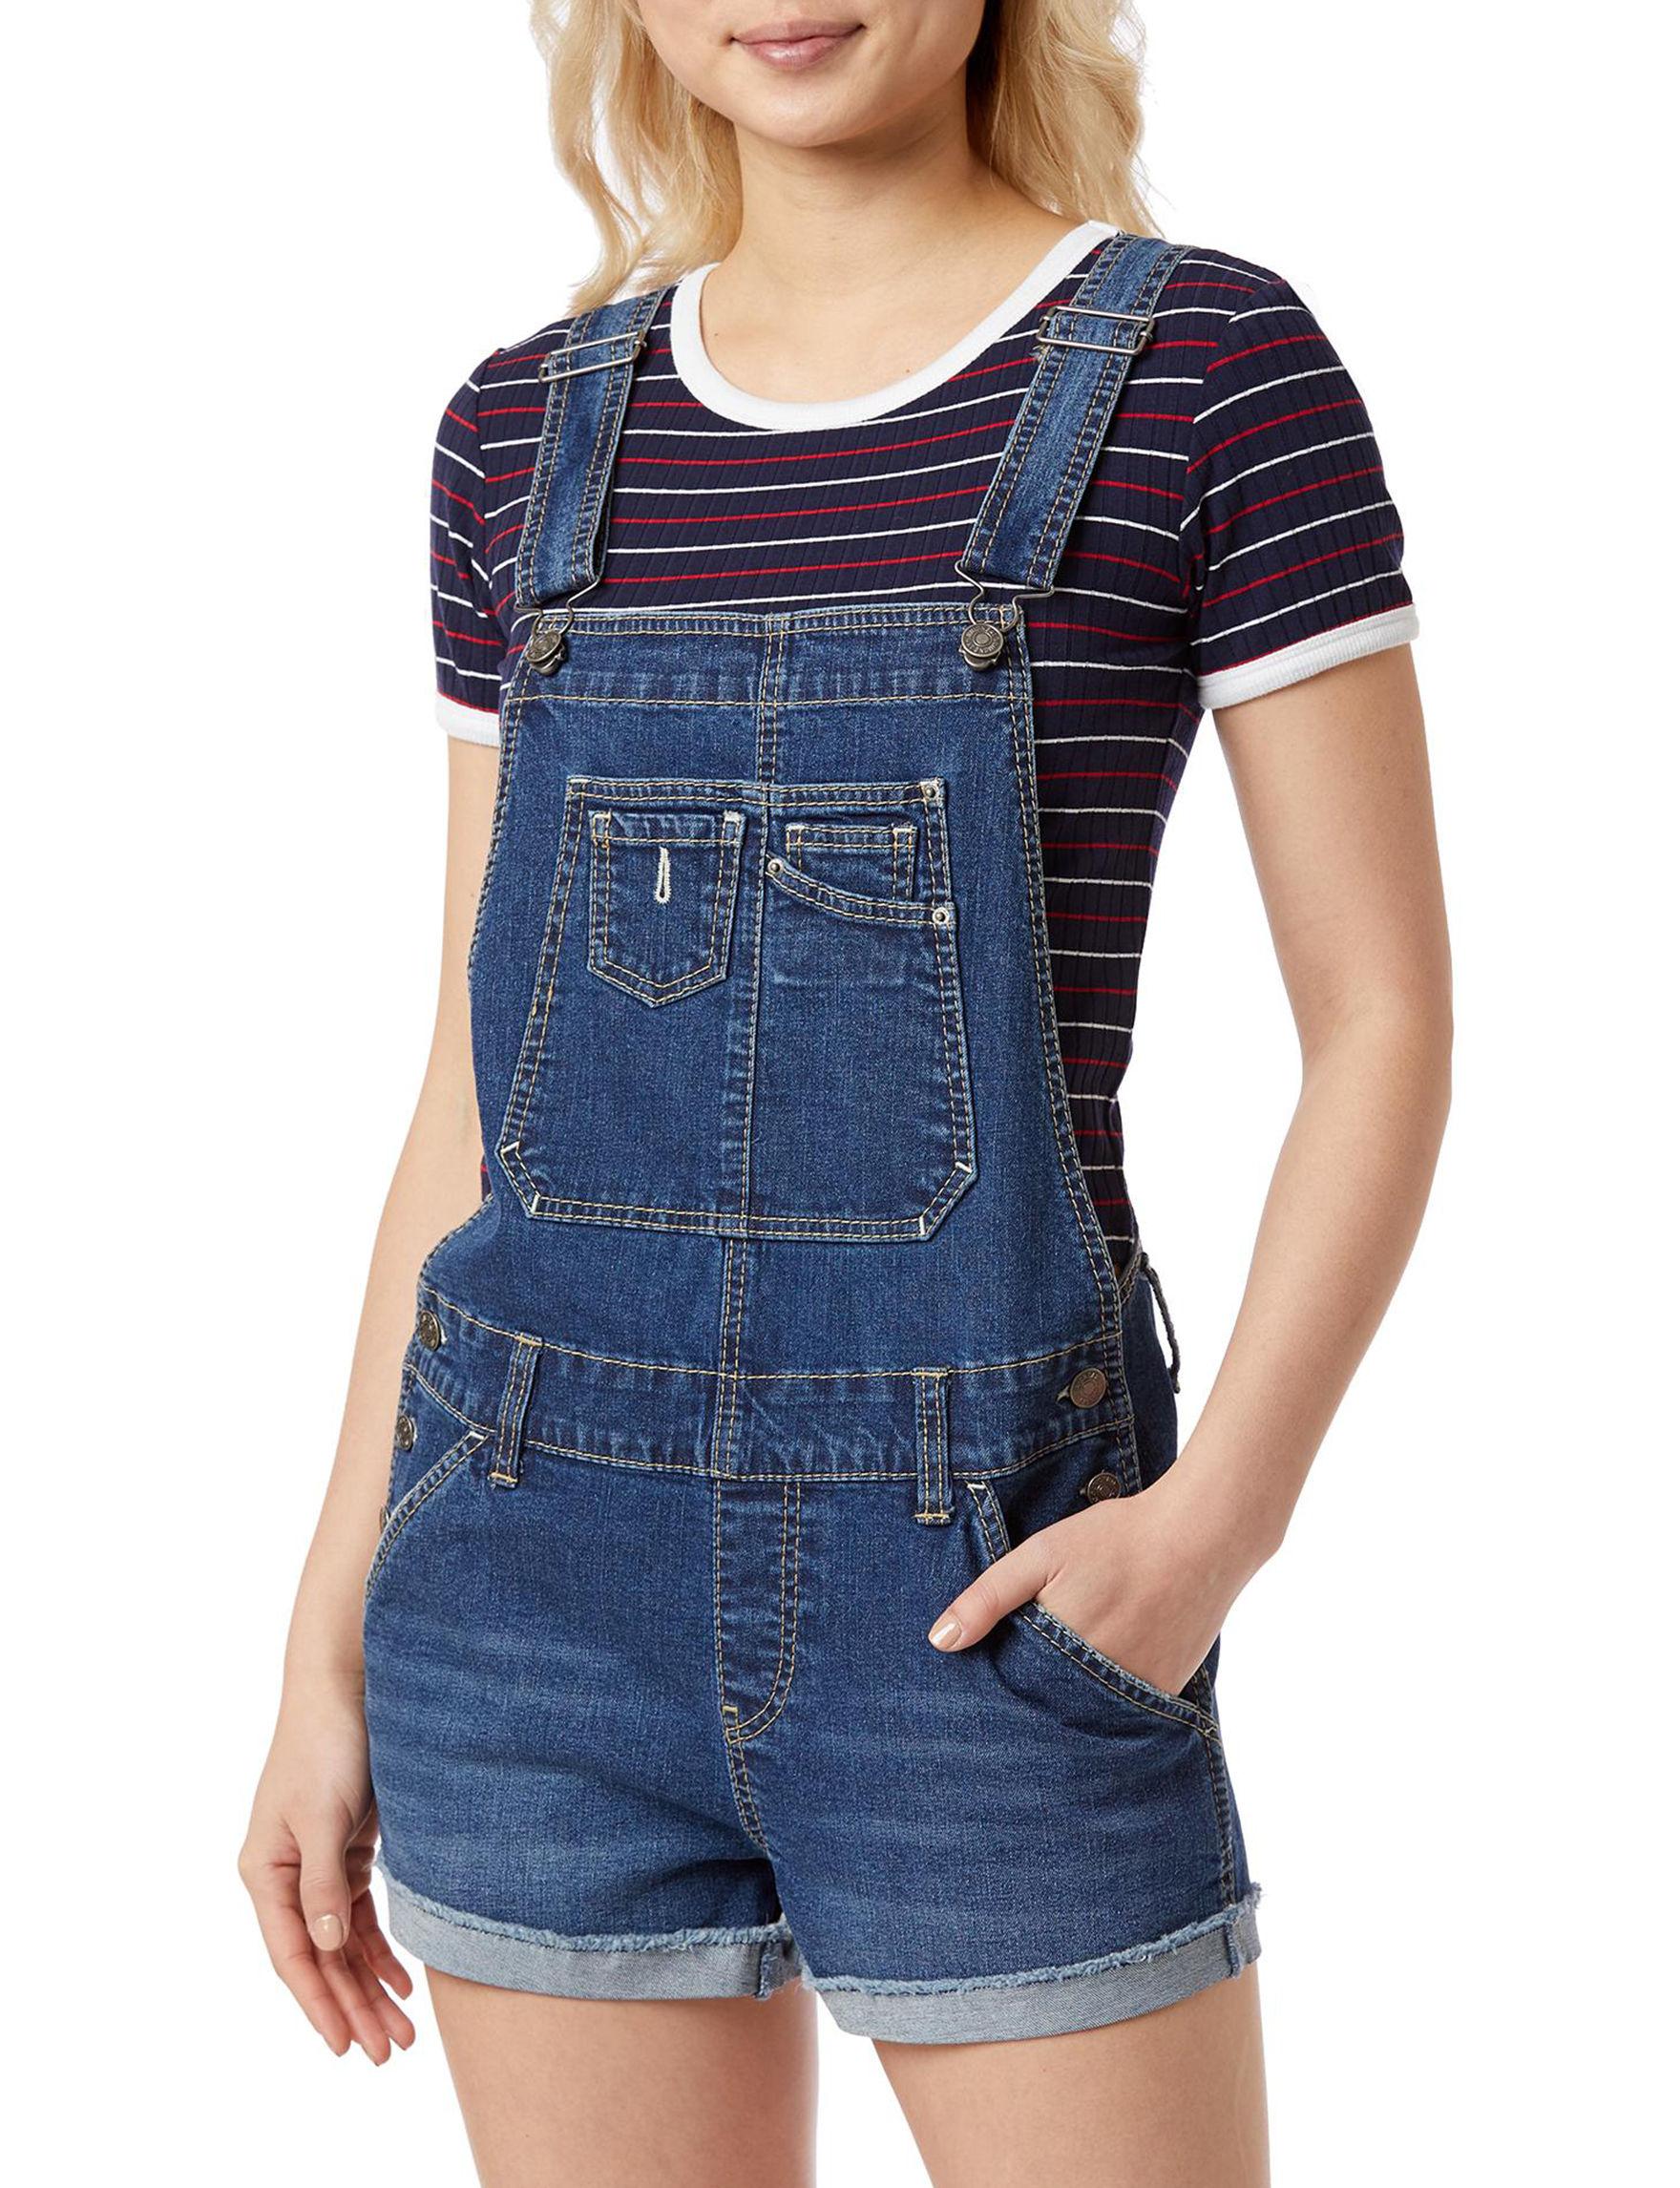 Unionbay Blue Denim Shorts